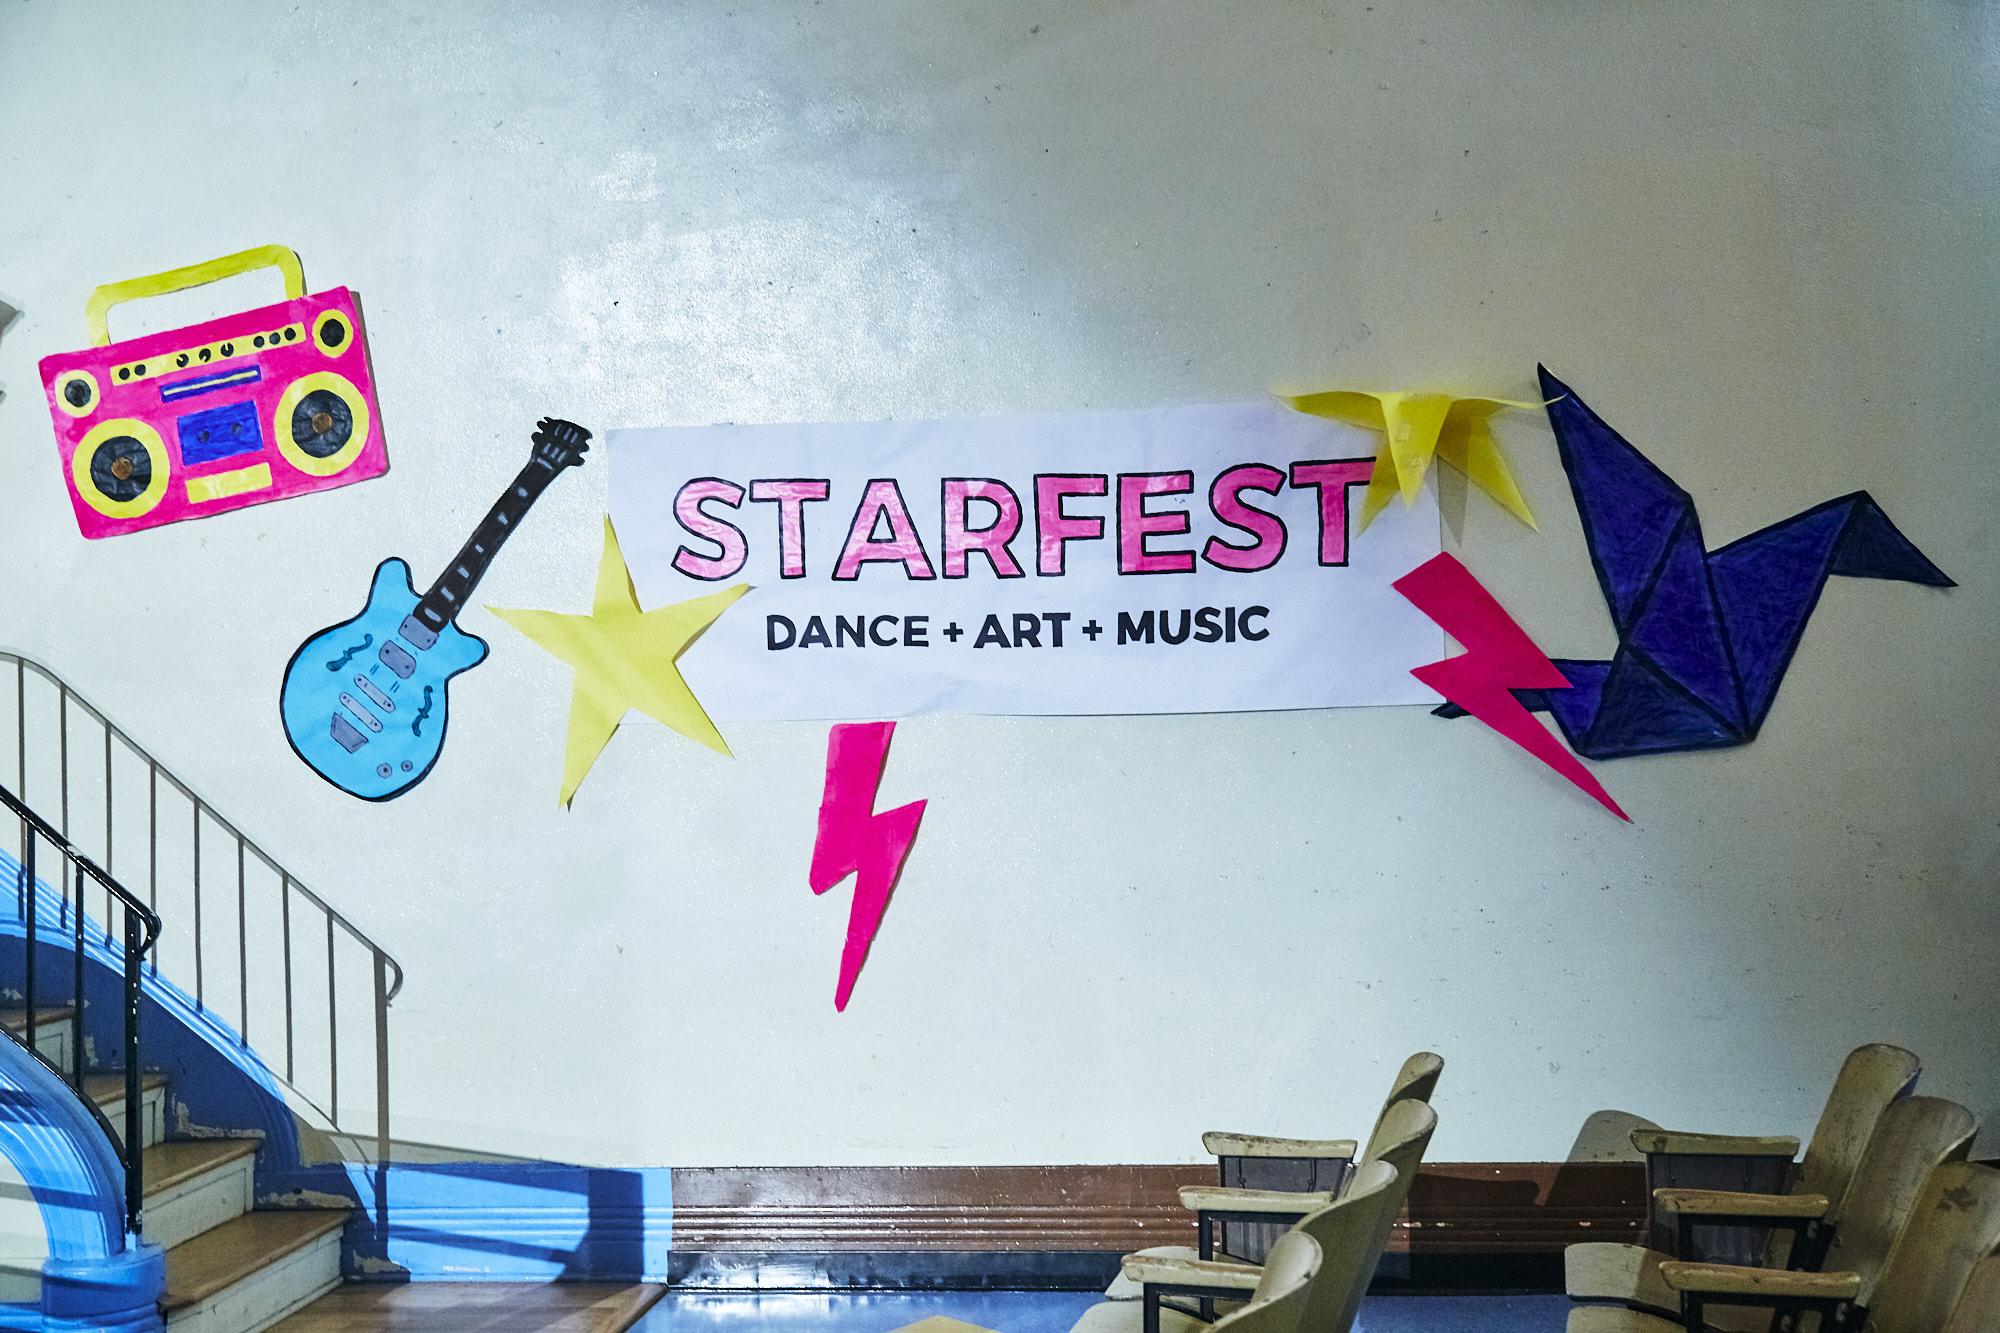 LACER_Starfest_MG_5046.jpg